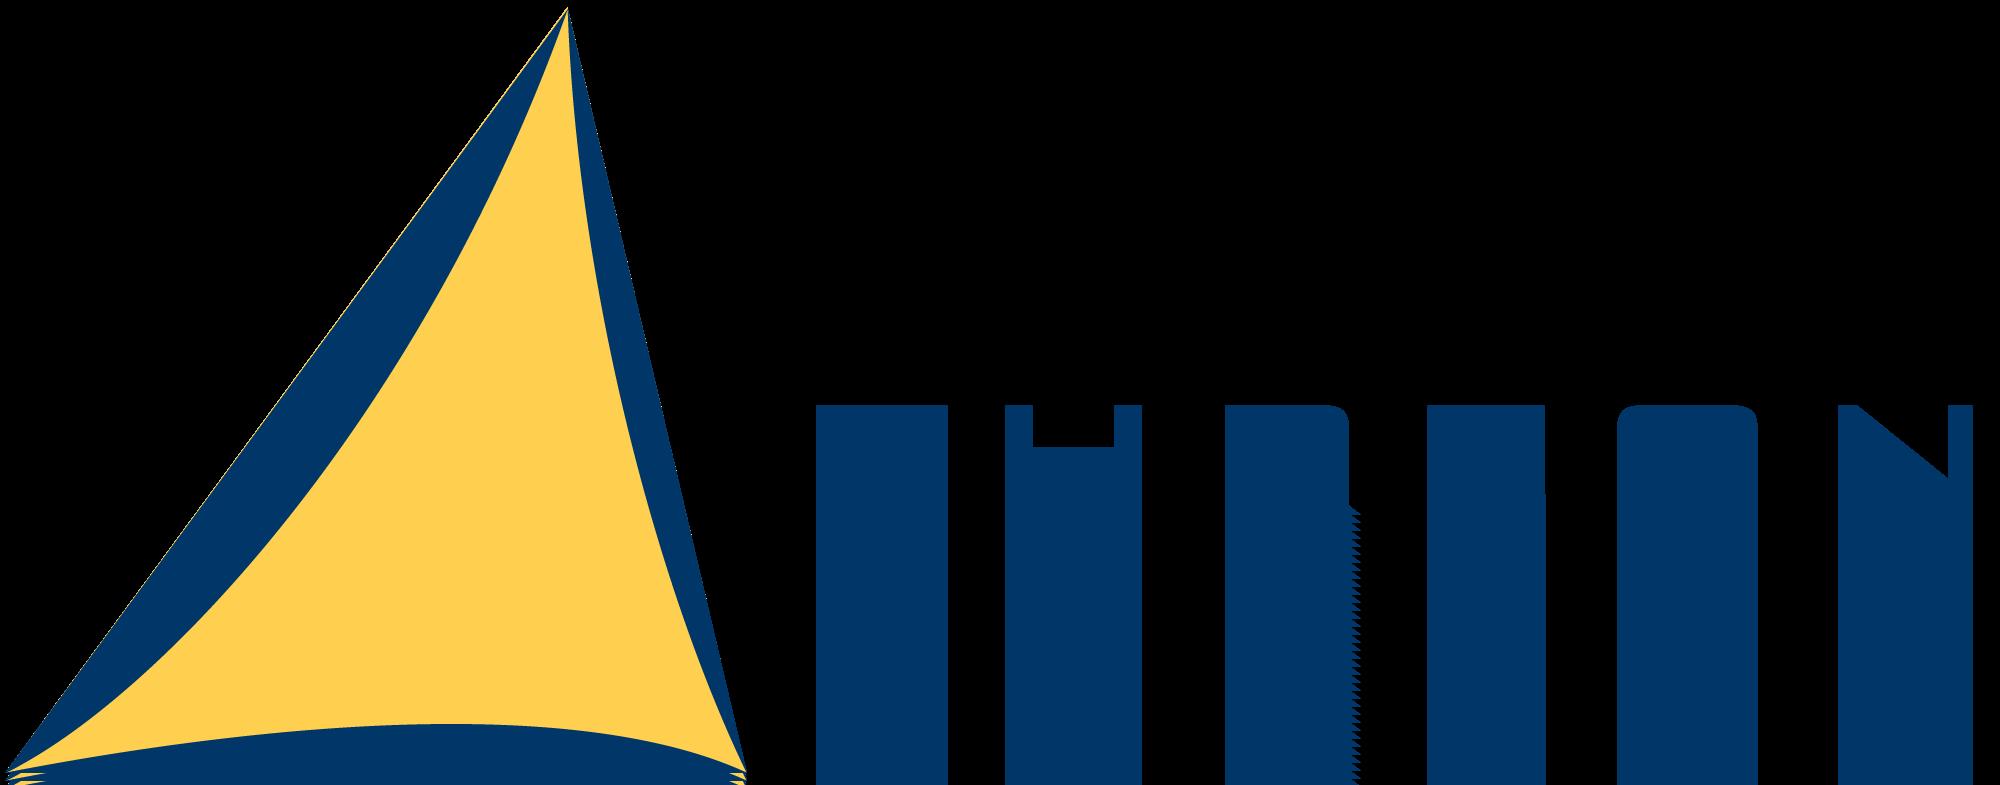 Threon_Logo.png